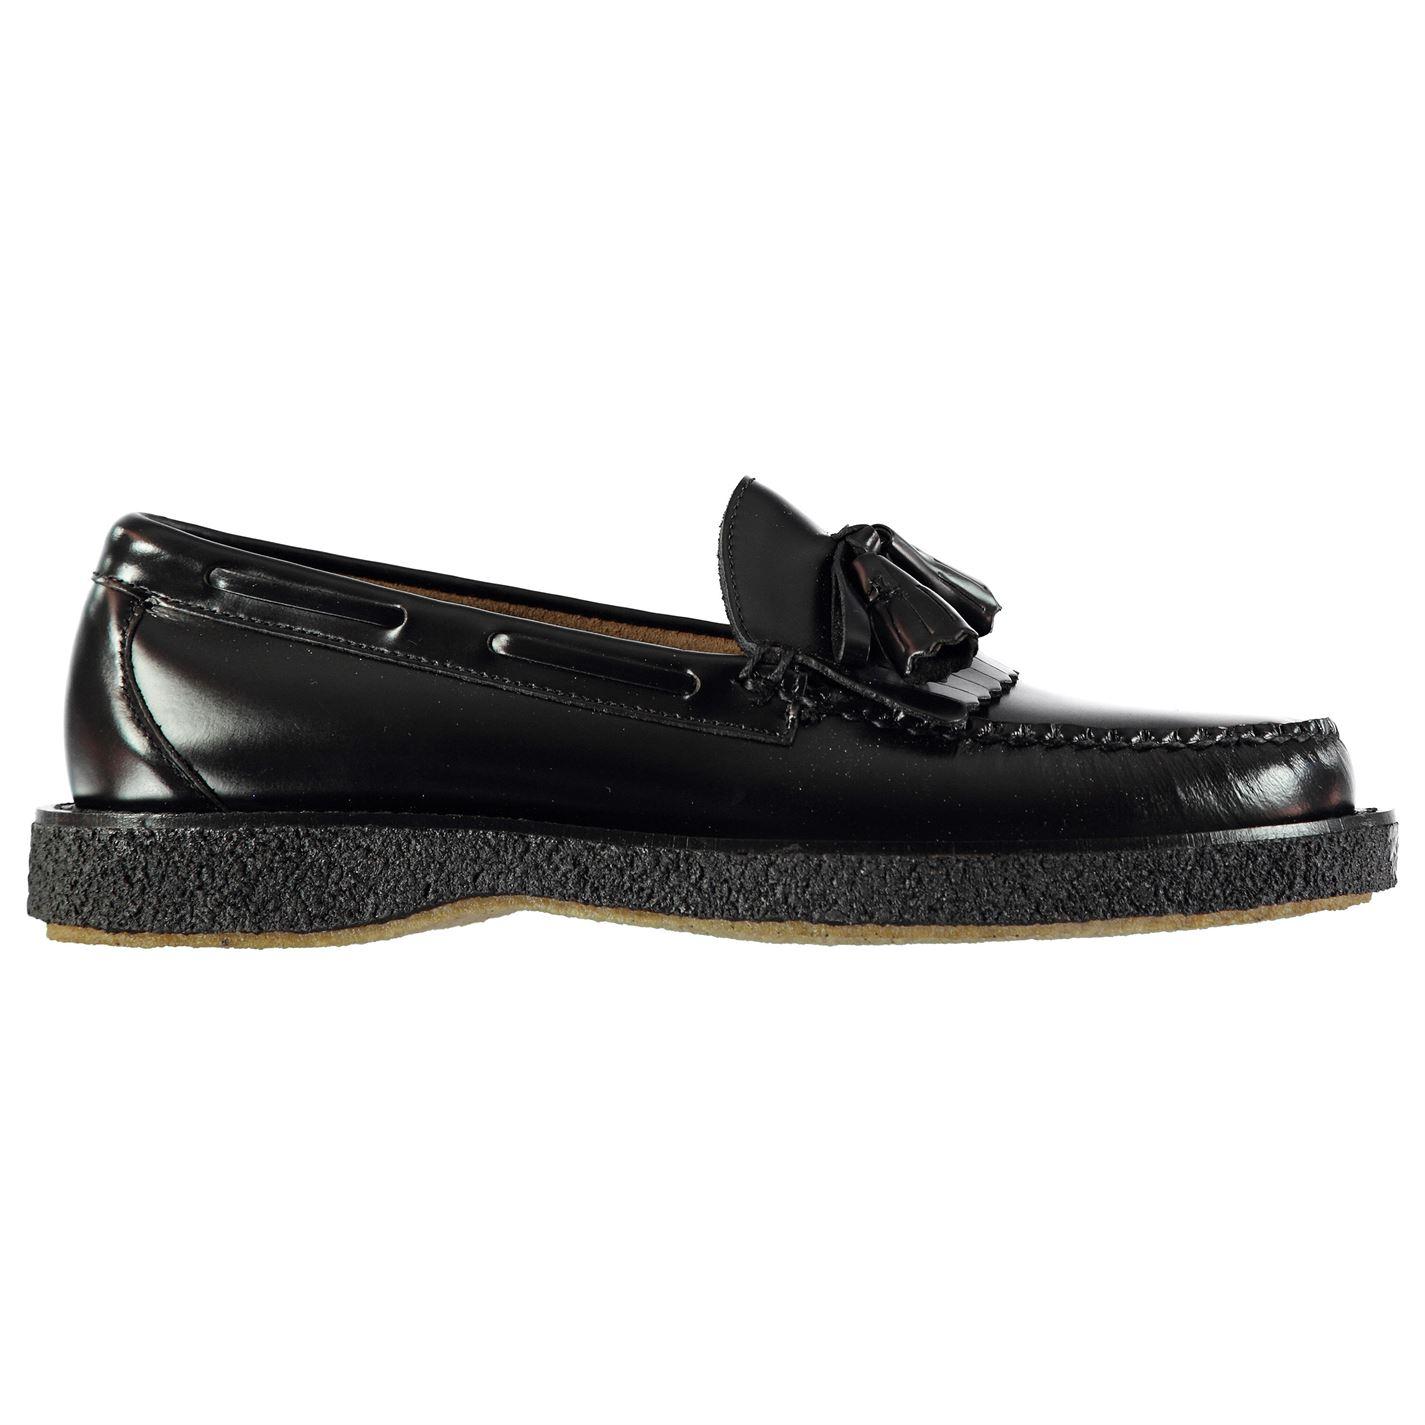 Bass Weejuns Layton Kiltie Shoes